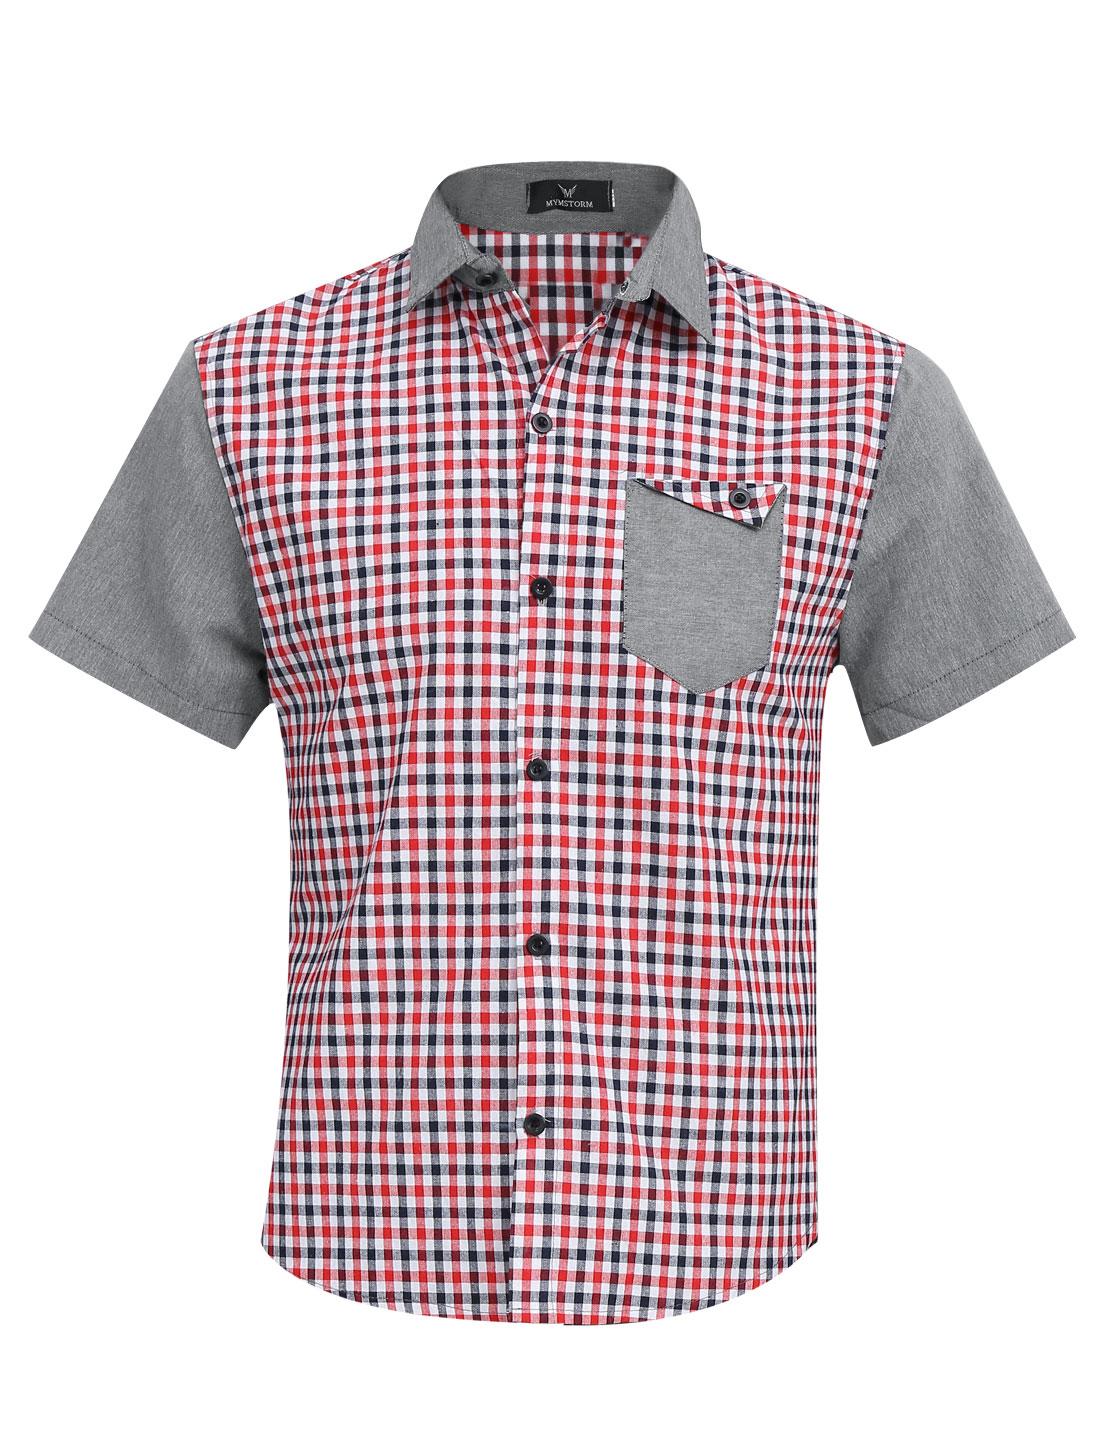 Men Fashion Point Collar Plaids Pattern Splicing Shirt Red Light Gray M